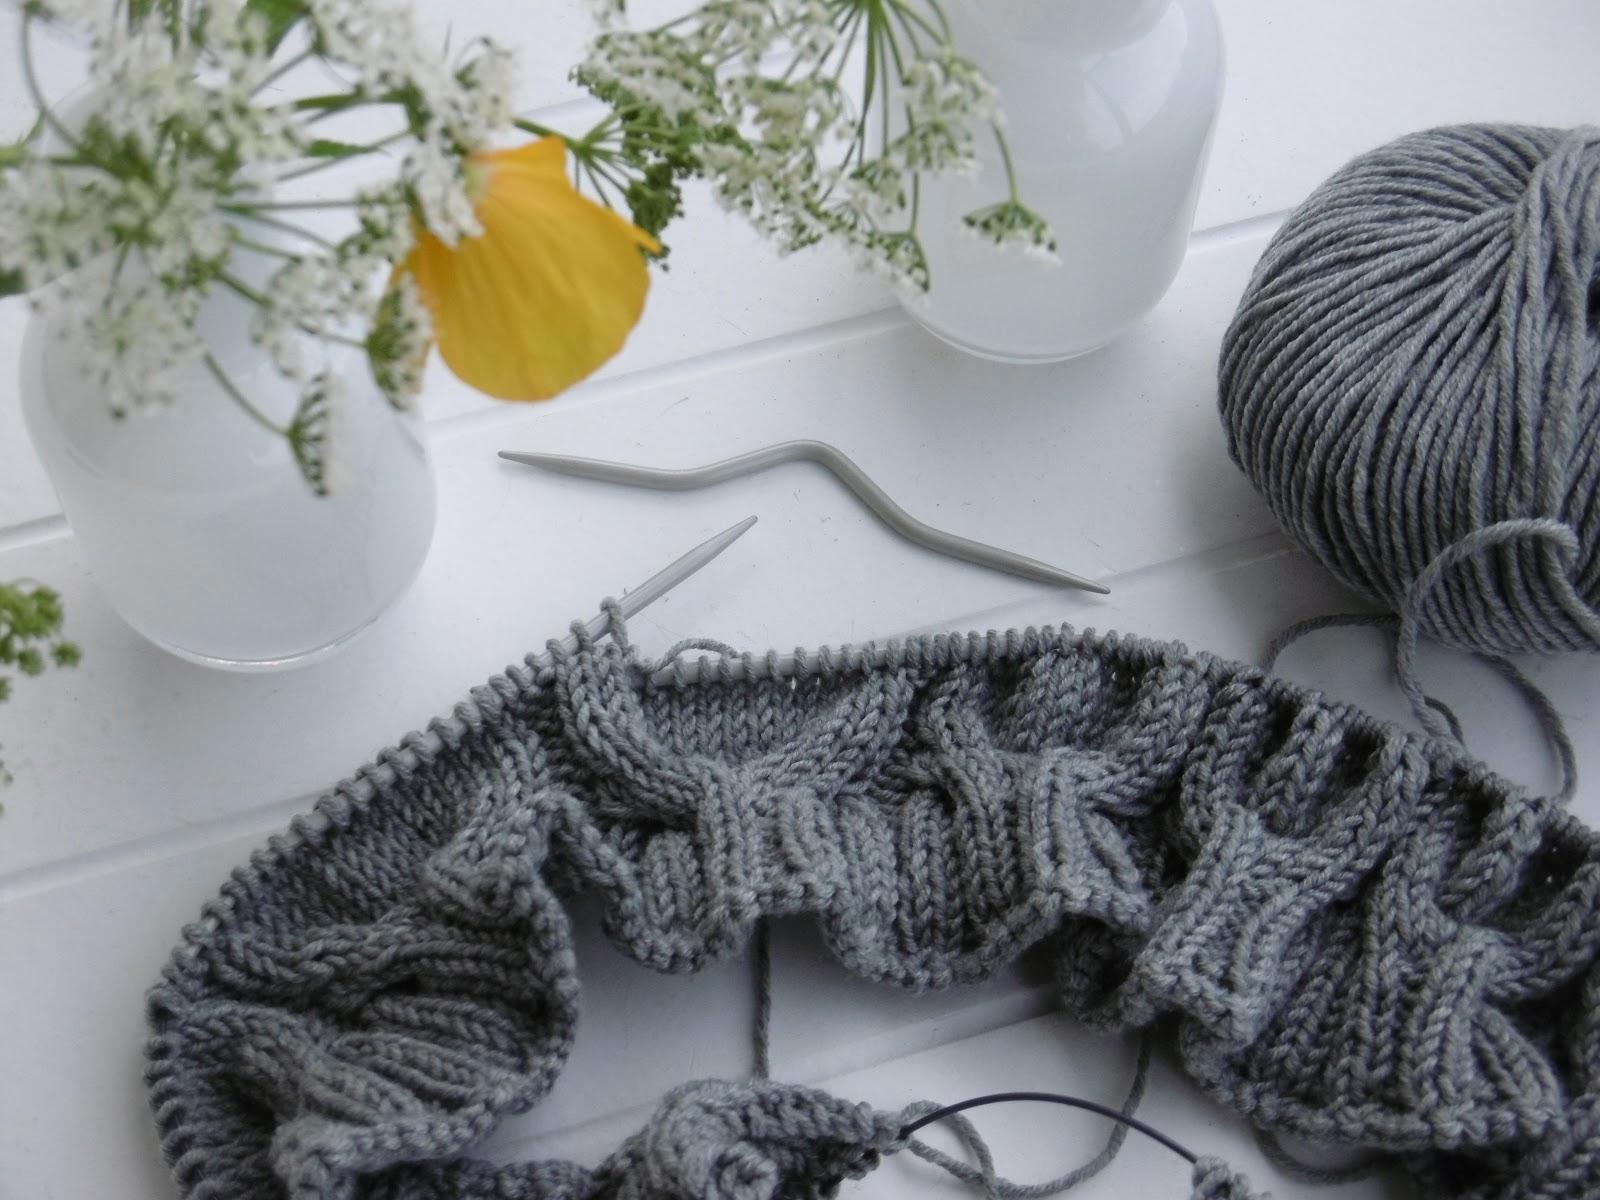 Fein Höhen Häkeldecke Muster Fotos - Schnittmuster Kleid Ideen ...